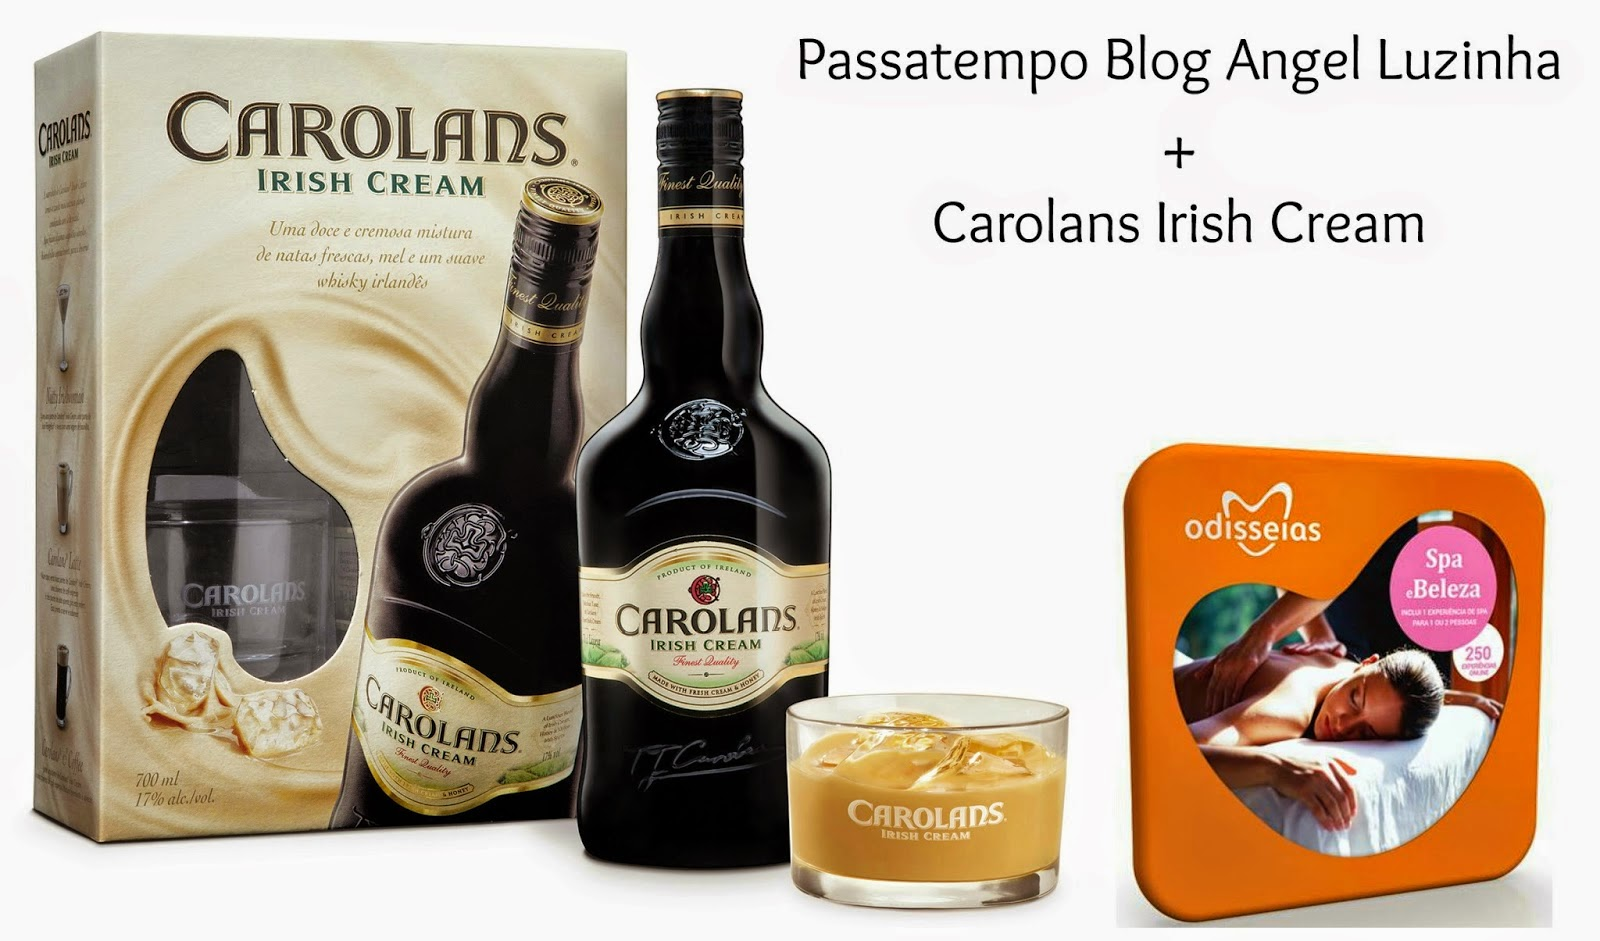 http://www.angel-luzinha.com/2014/12/passatempo-carolans-irish-cream.html